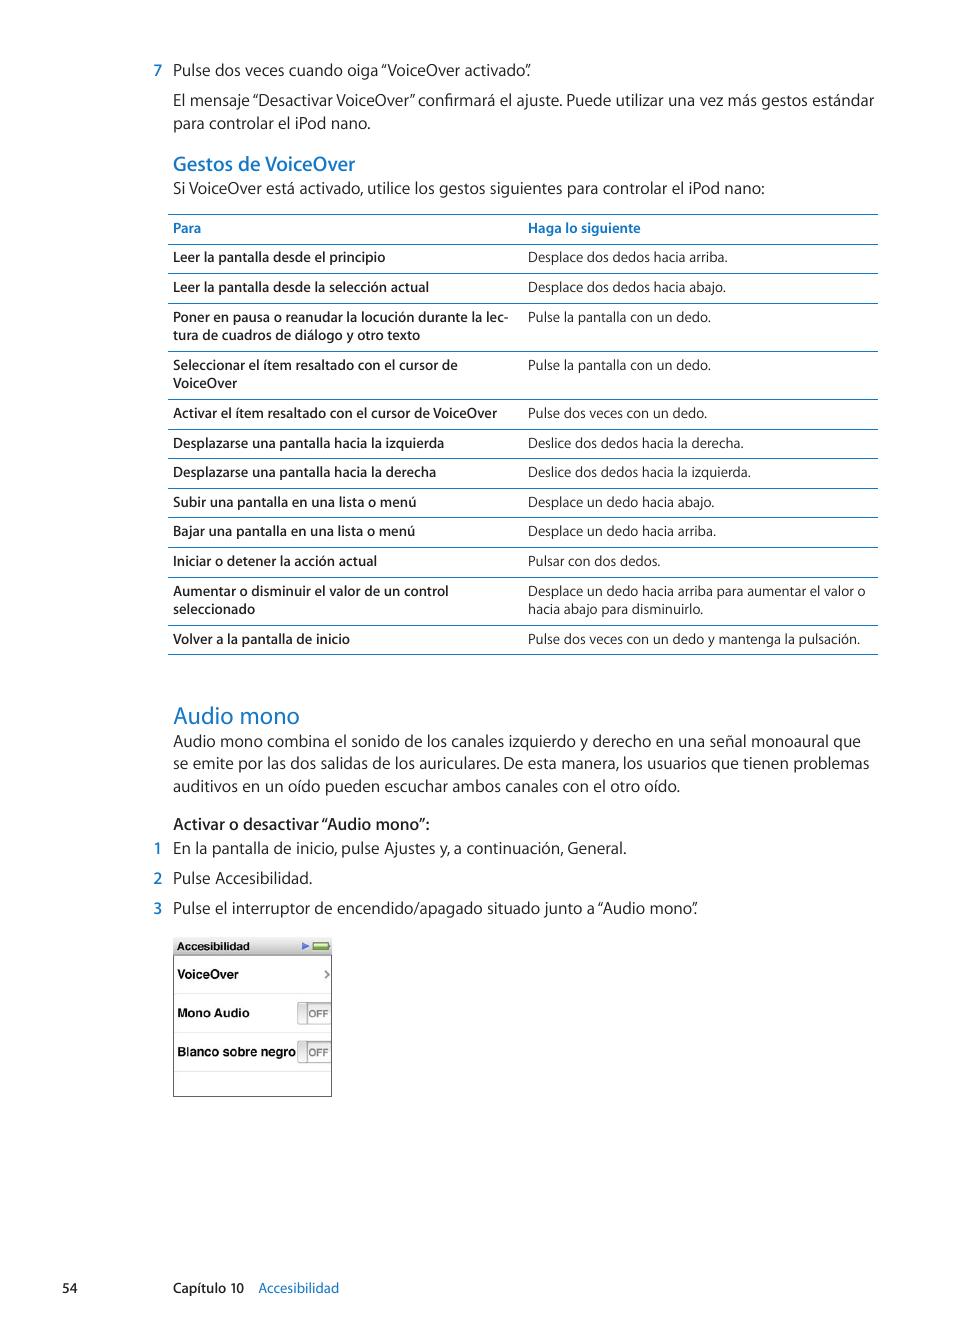 Audio mono, 54 audio mono, Gestos de voiceover | Apple iPod nano (6th